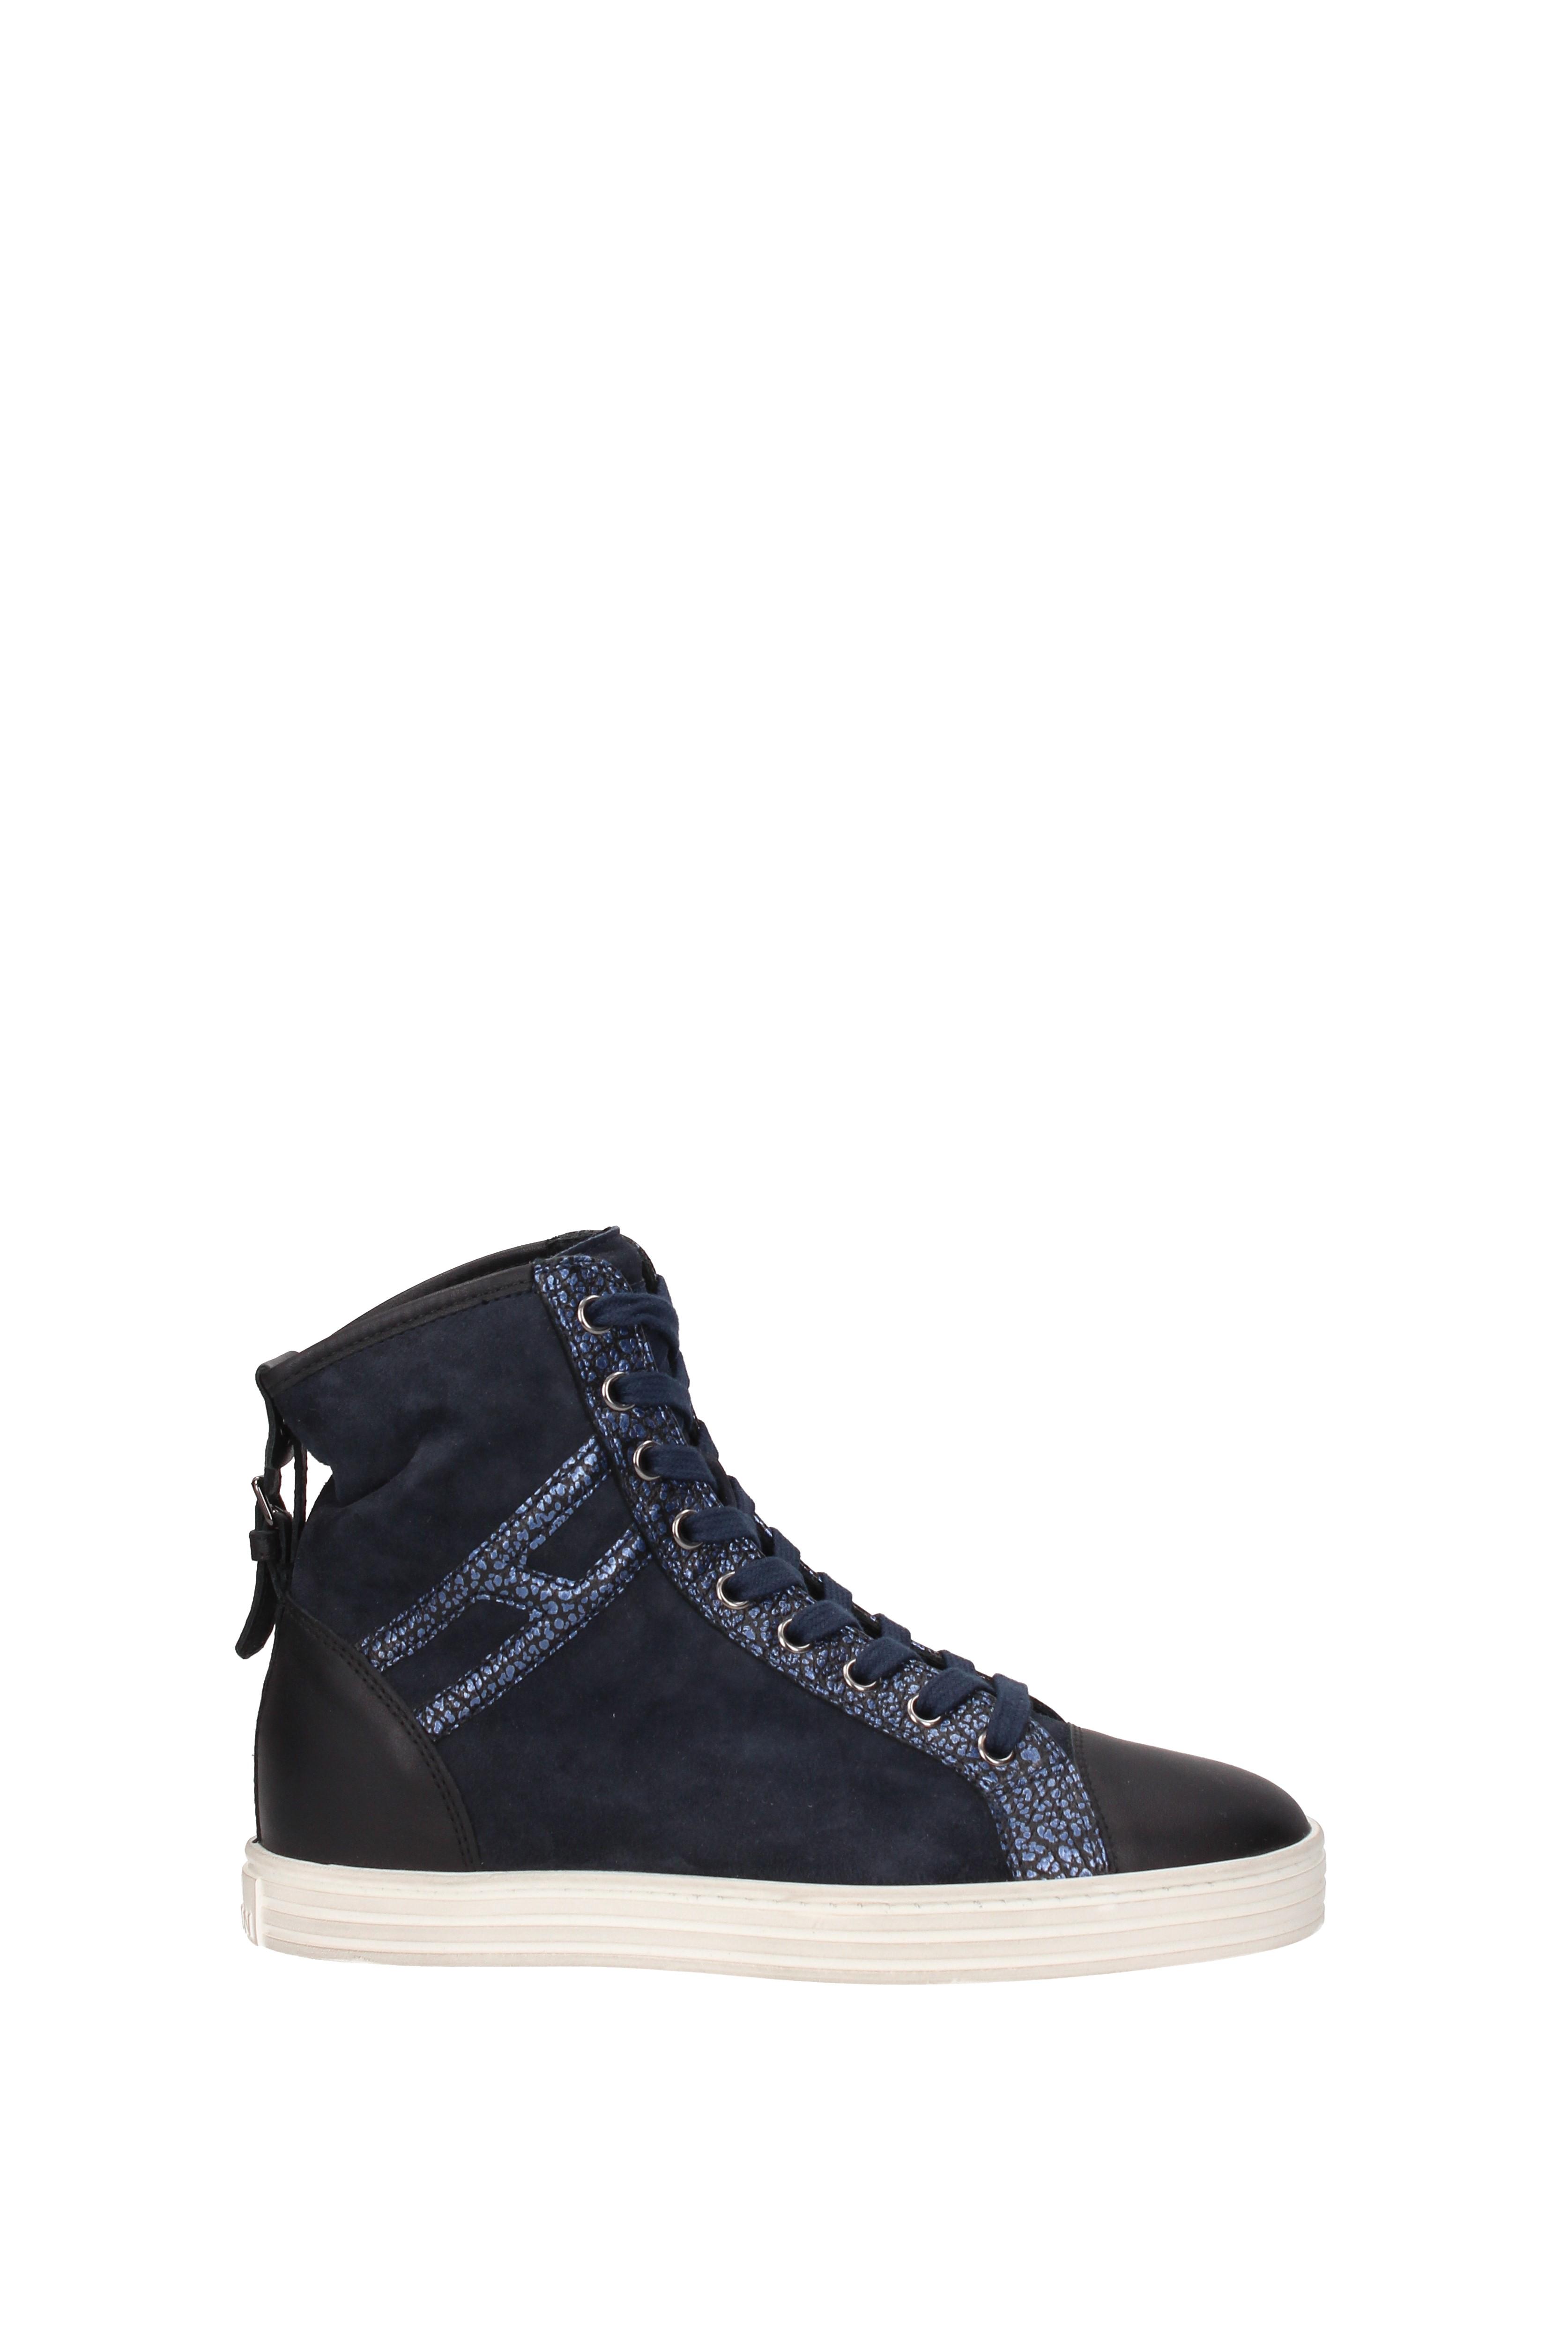 Sneakers Hogan rebel Donna Camoscio HXW1820D661EJA - duradrusti.org e09130f3ed8